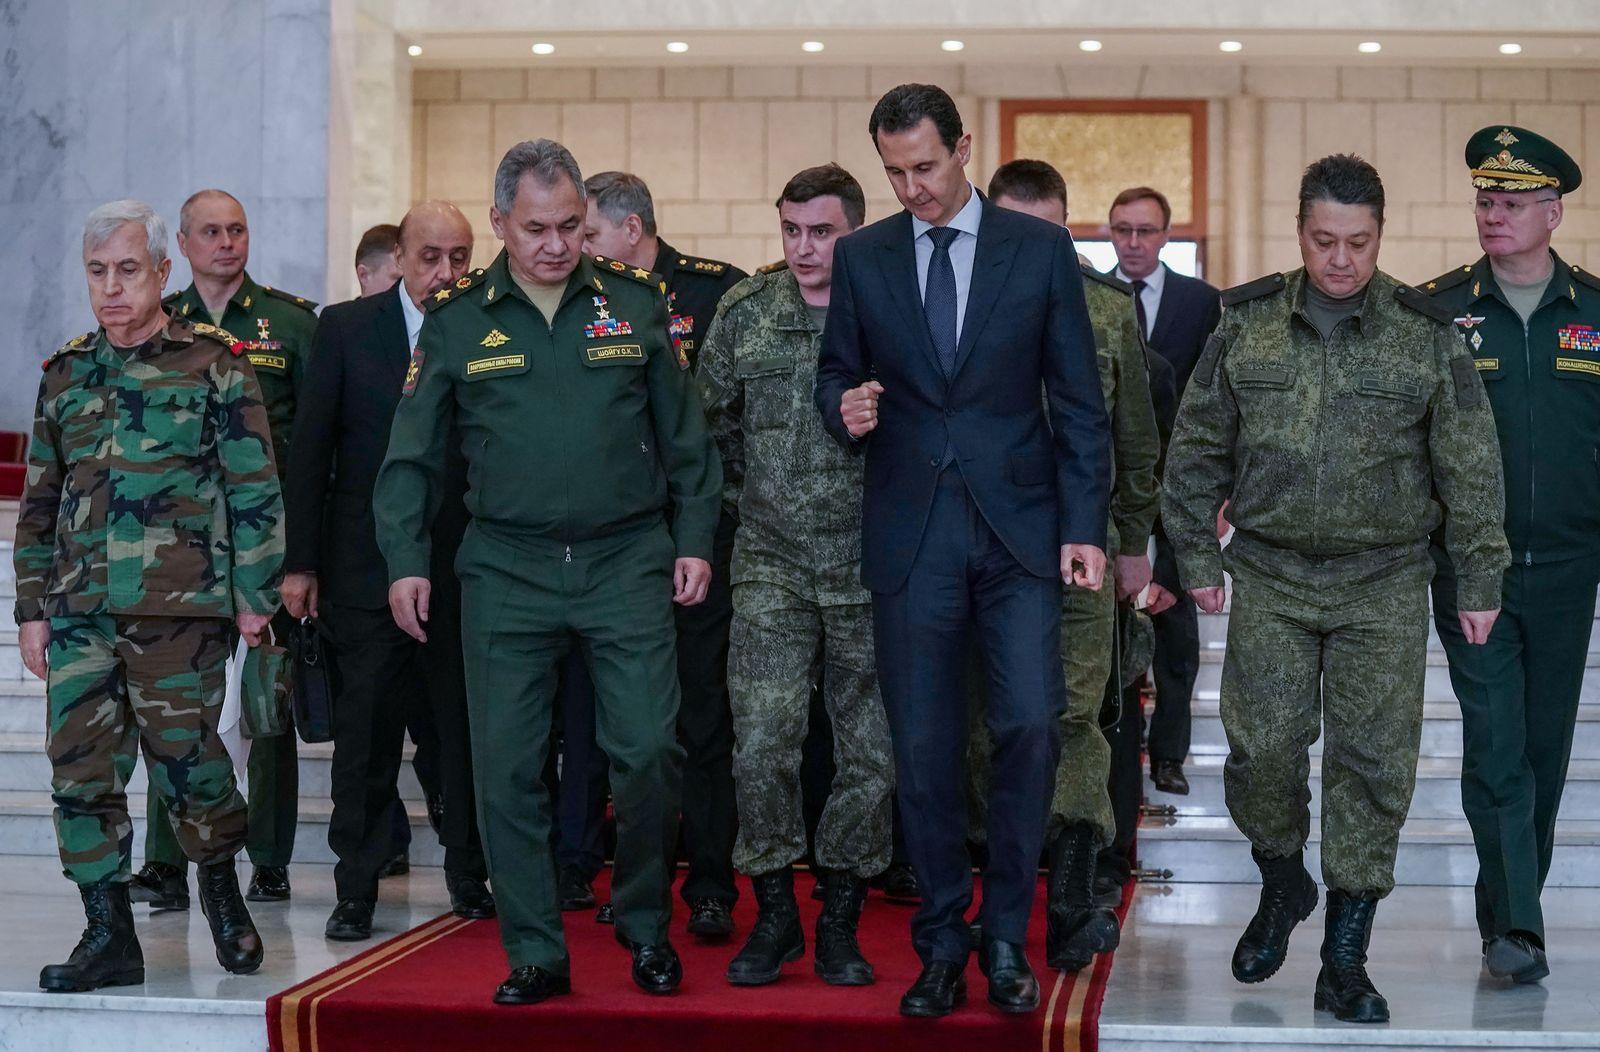 Russian Defense Minister Sergei Shoigu visits Damascus, Syria - 23 Mar 2020